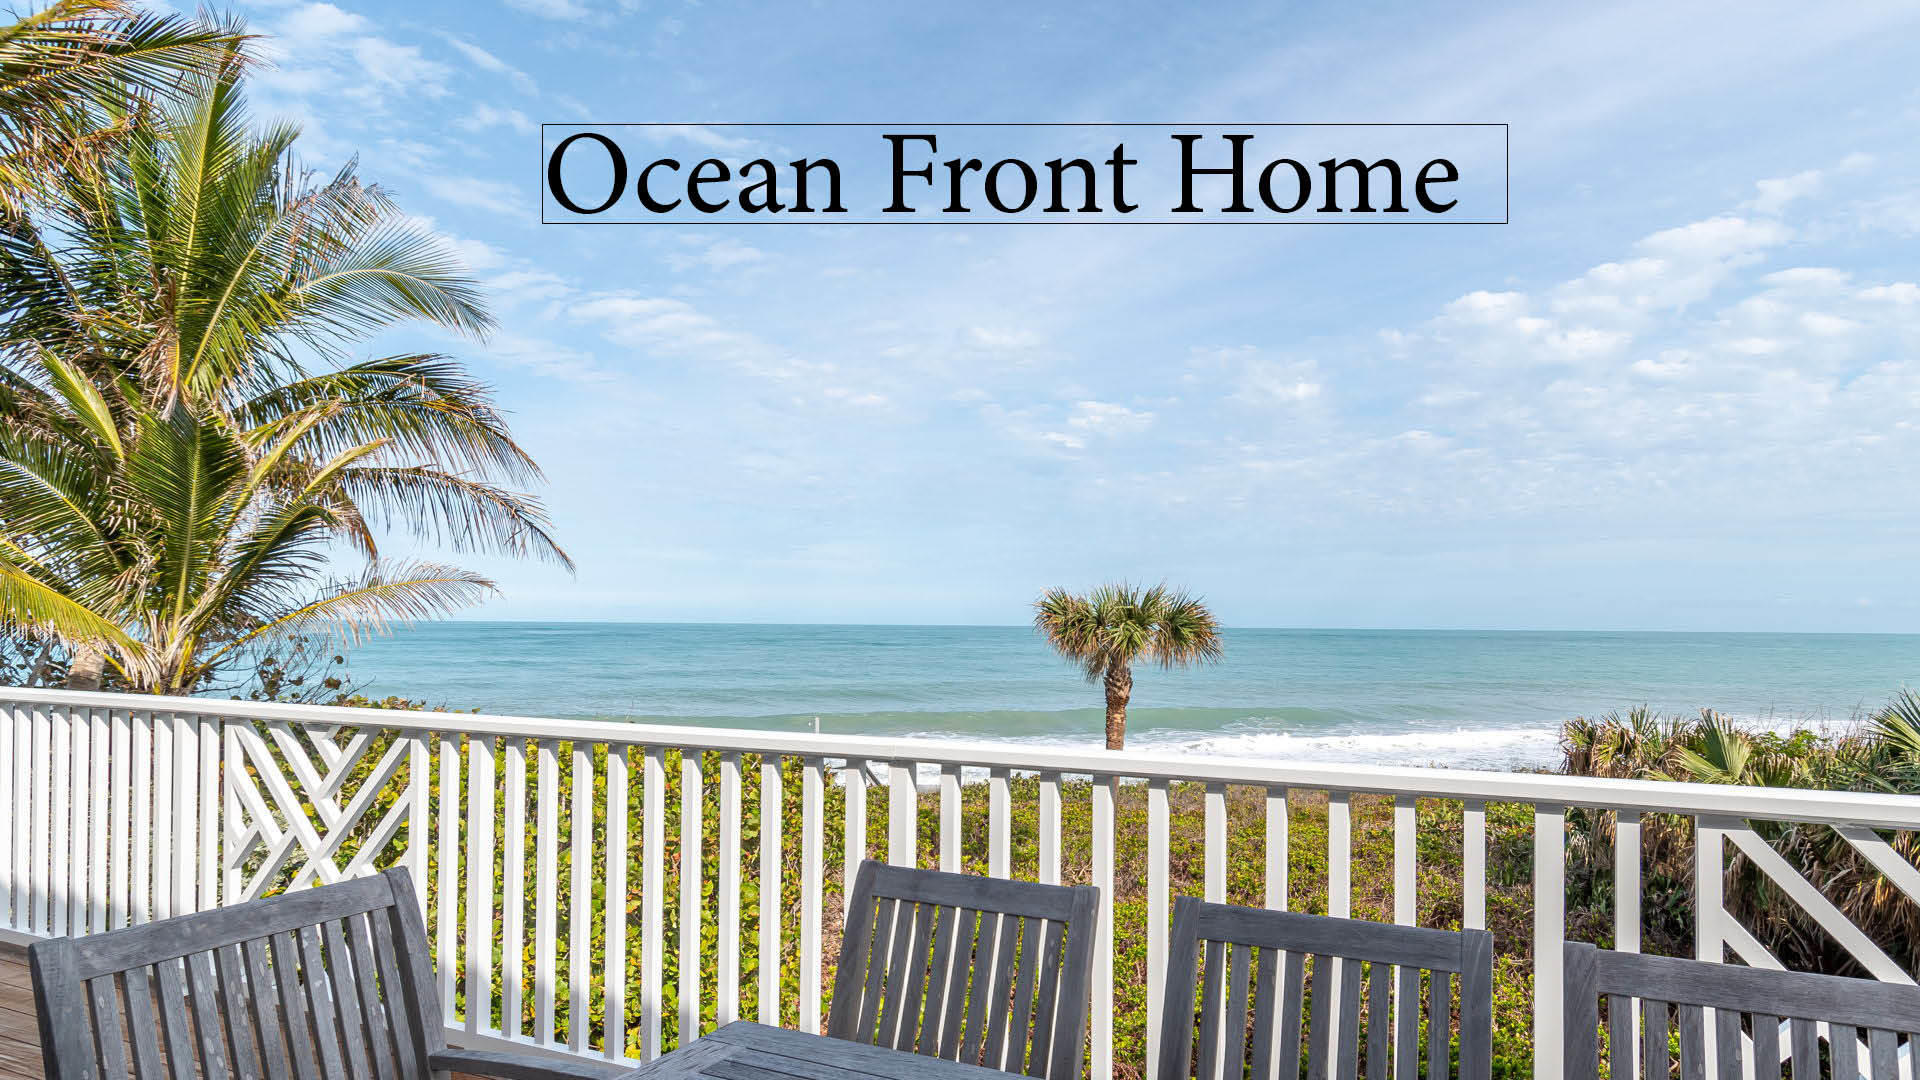 Details for 1580 Shorelands Drive, Vero Beach, FL 32963